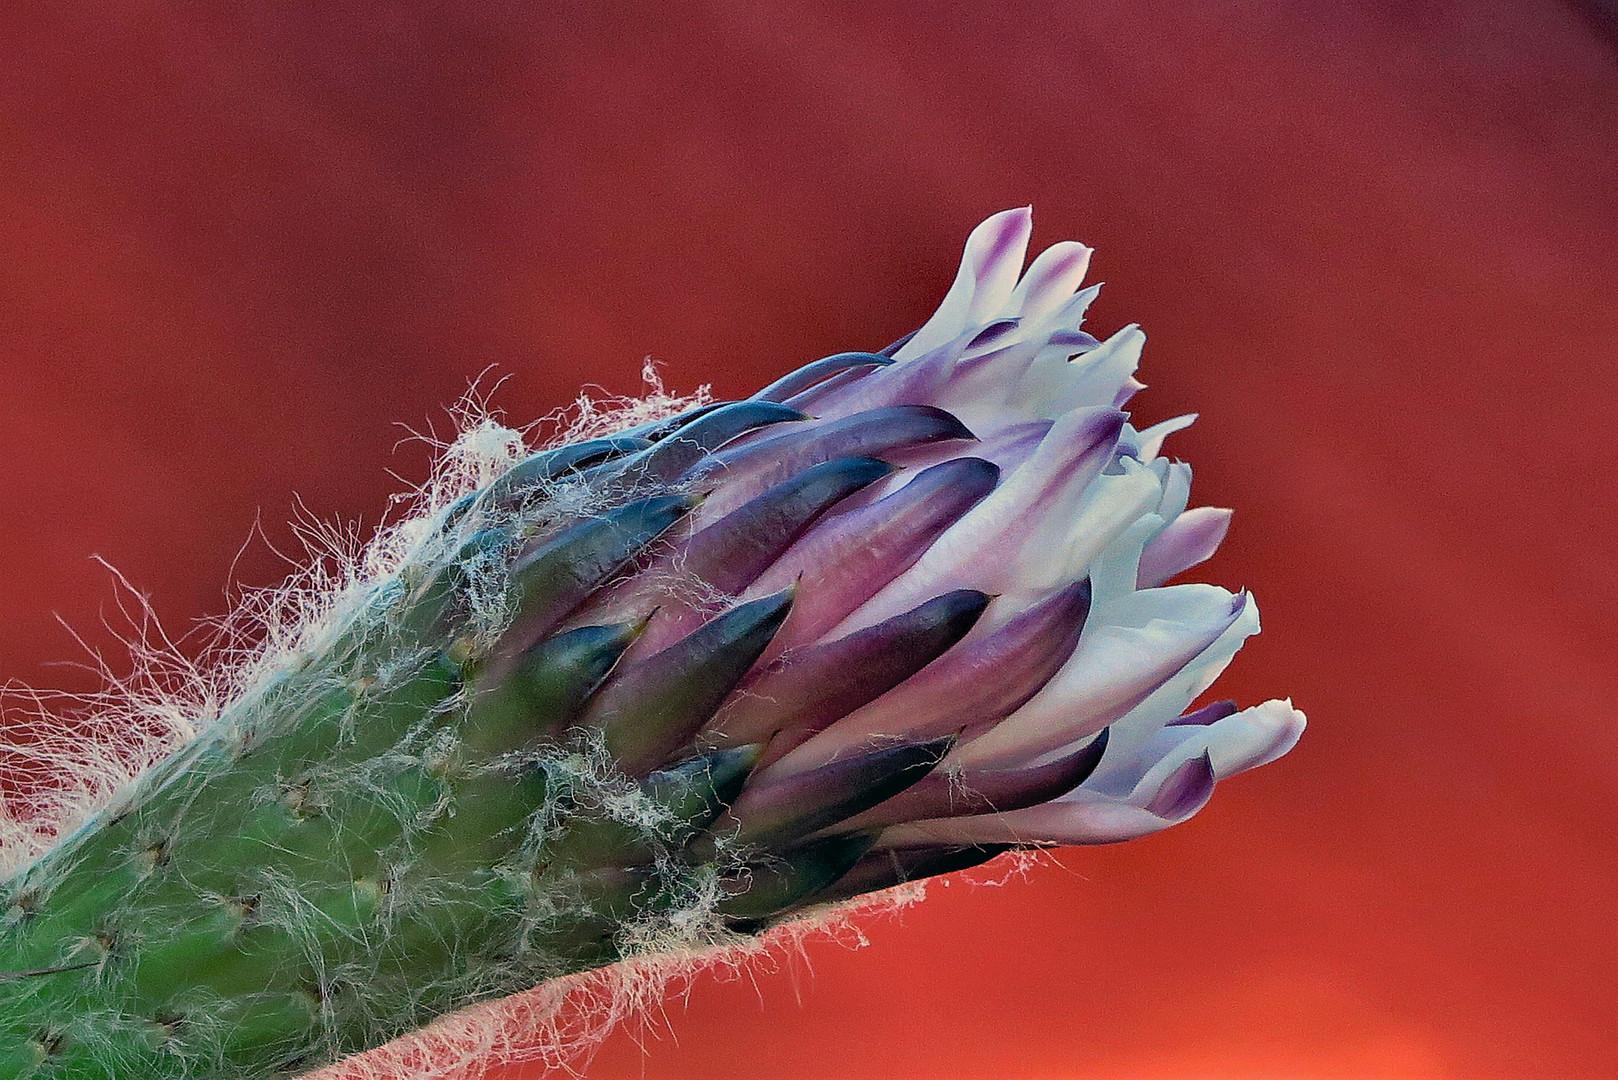 Hairy Cactus Flower Bud 2